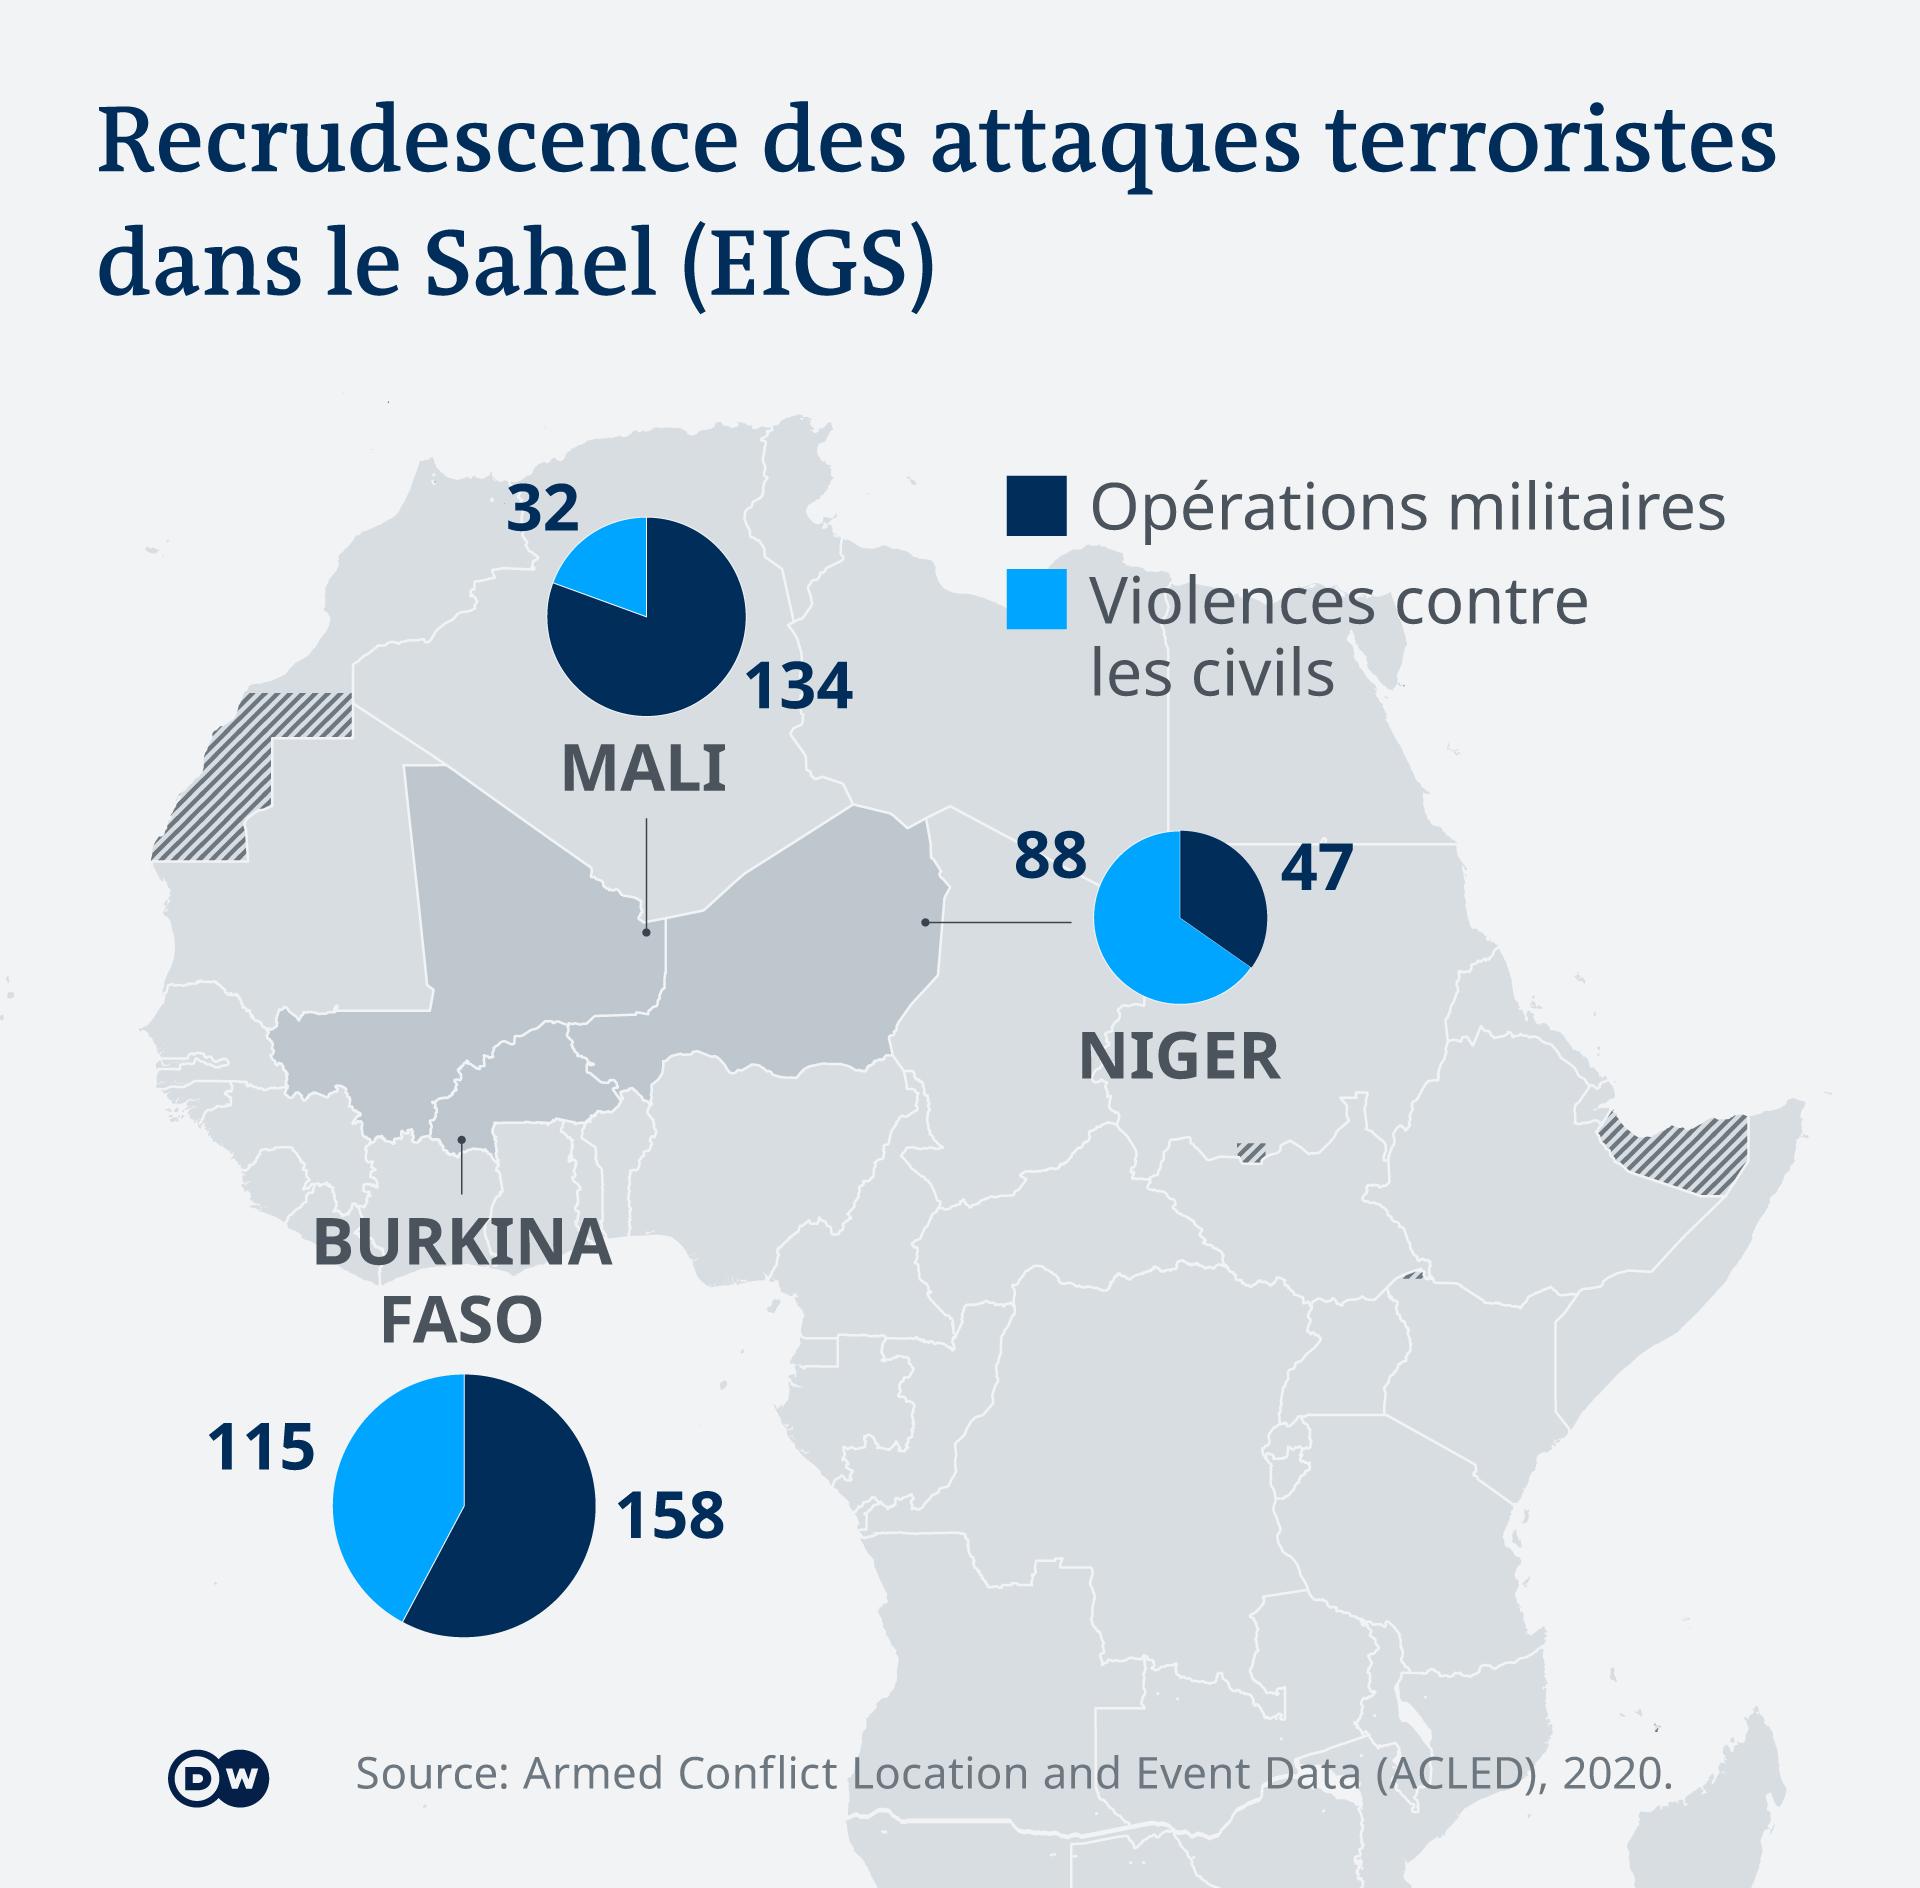 Au Niger, les deux tiers des attaques terroristes visent les civils.